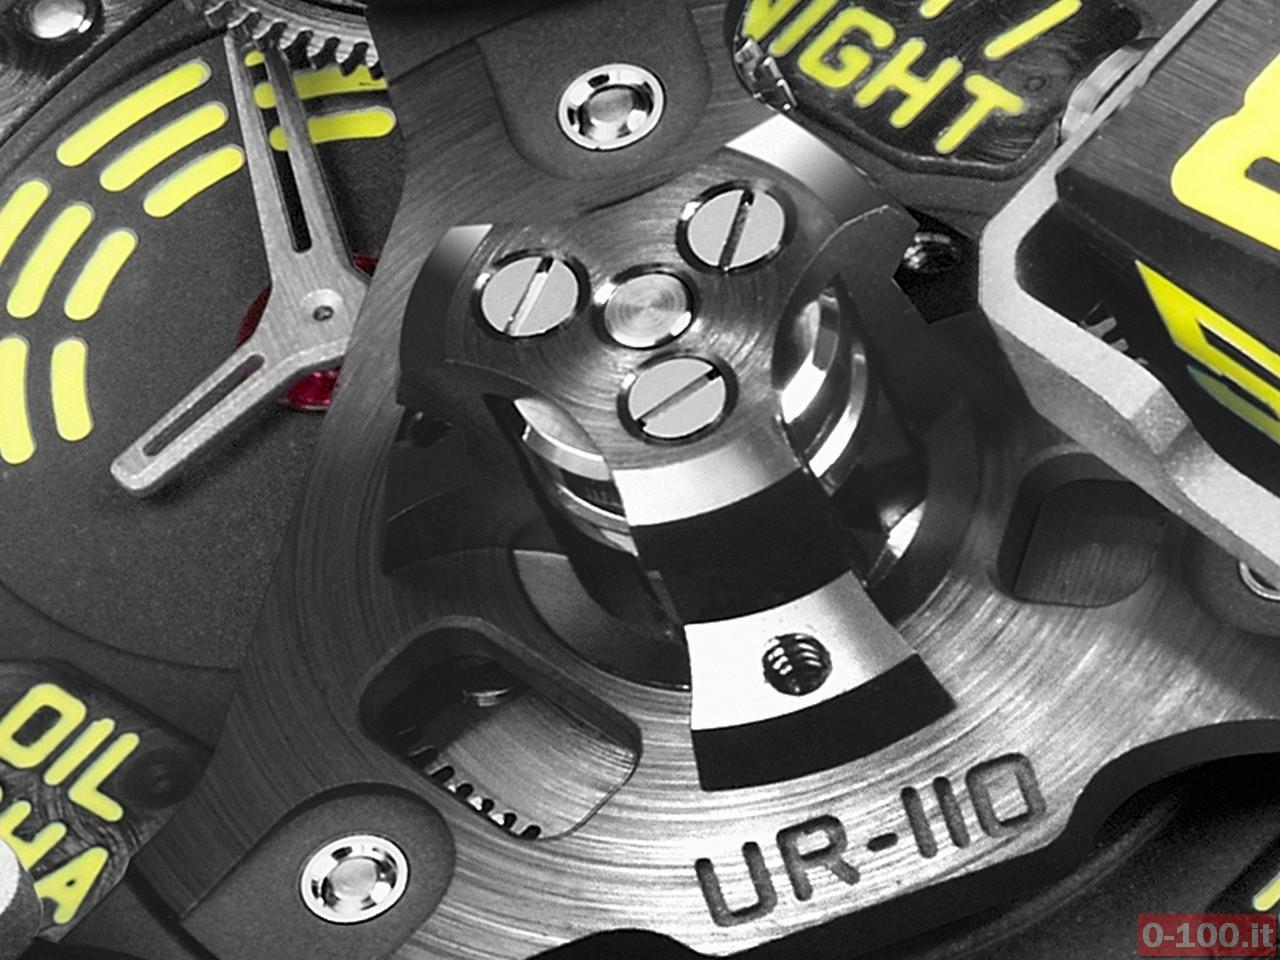 UR-110RsdasdasdG_HD